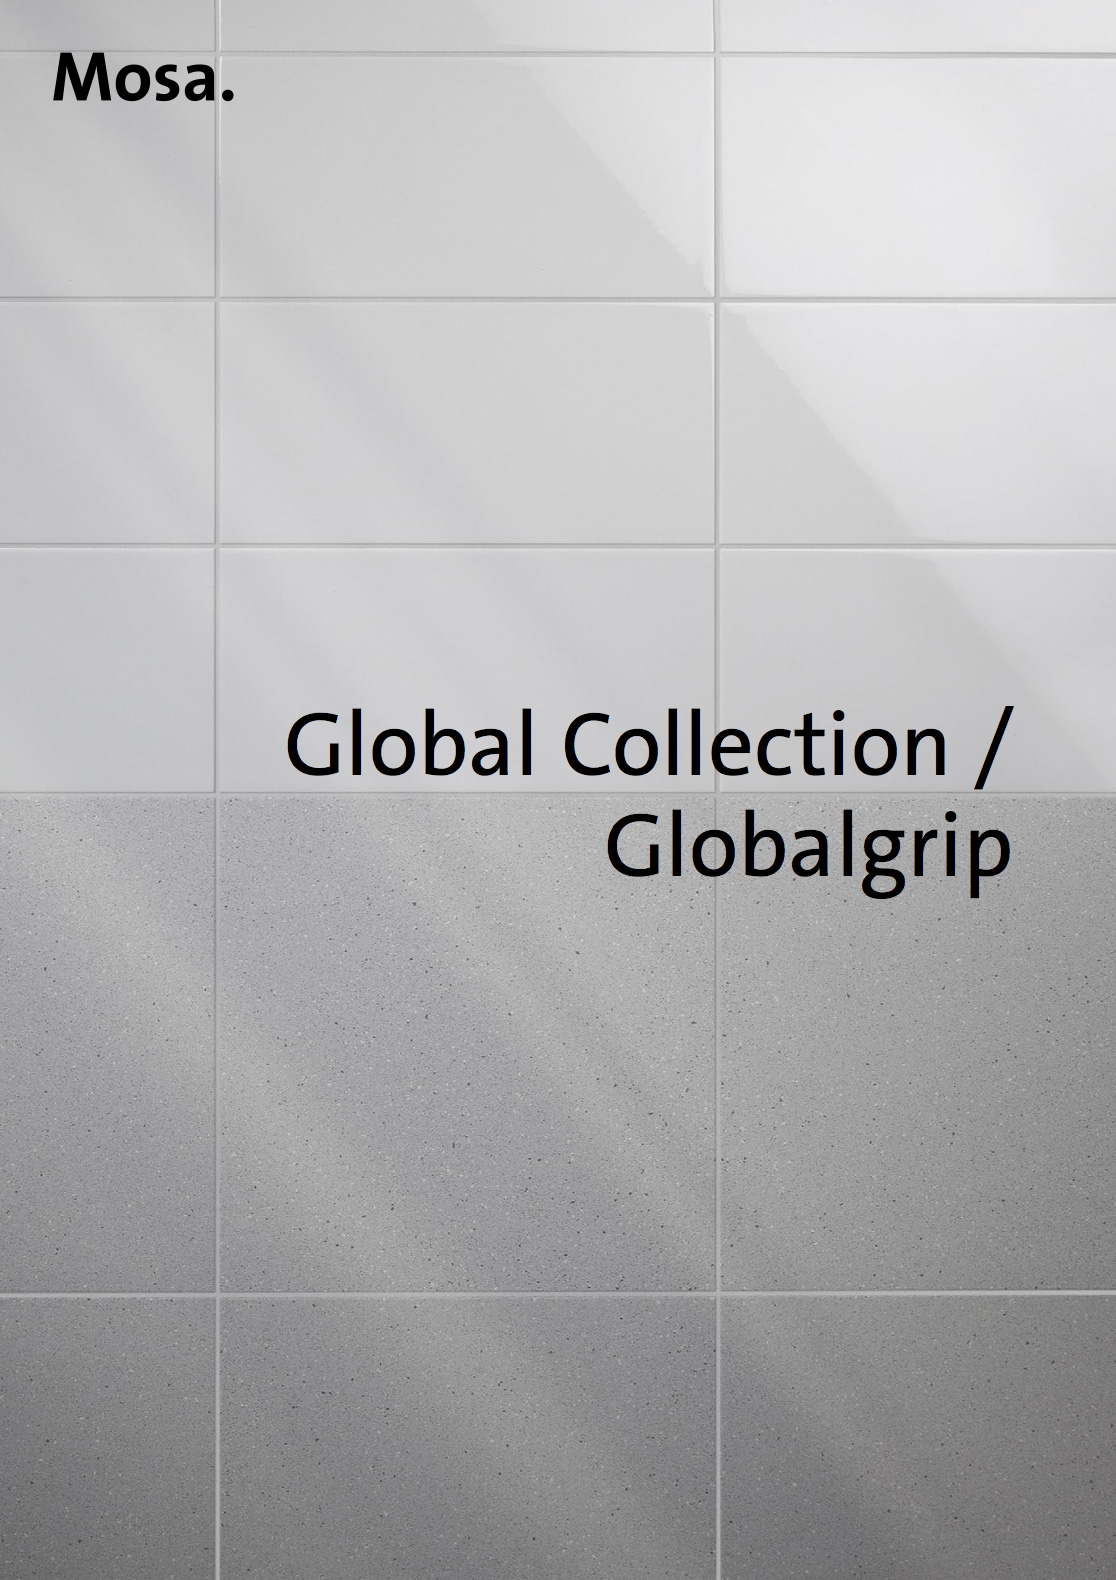 ditail-soluciones-mosaglobalgrip